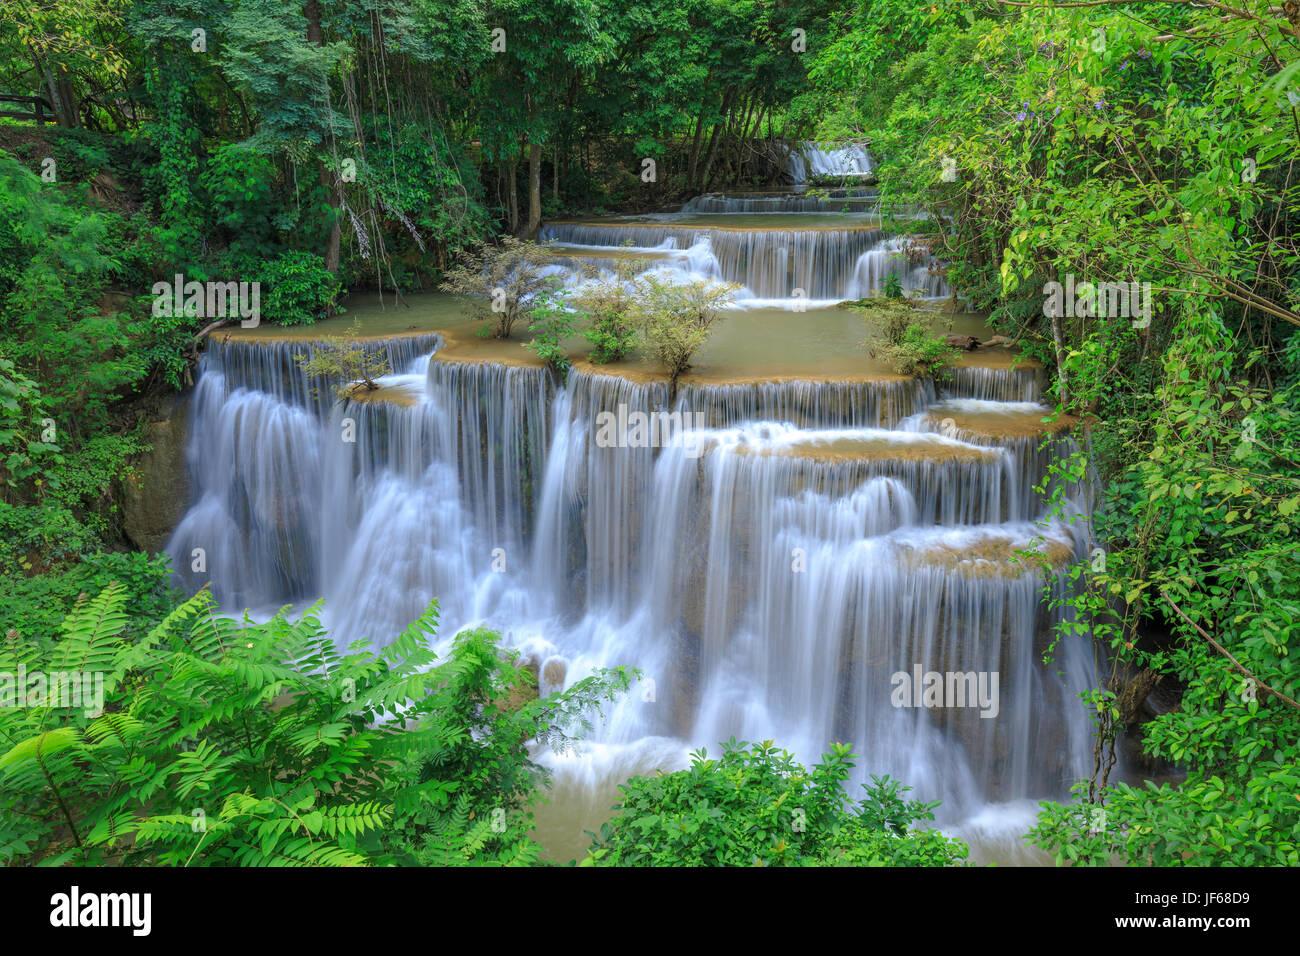 Deep forest Waterfall in Kanchanaburi province, Thailand - Stock Image